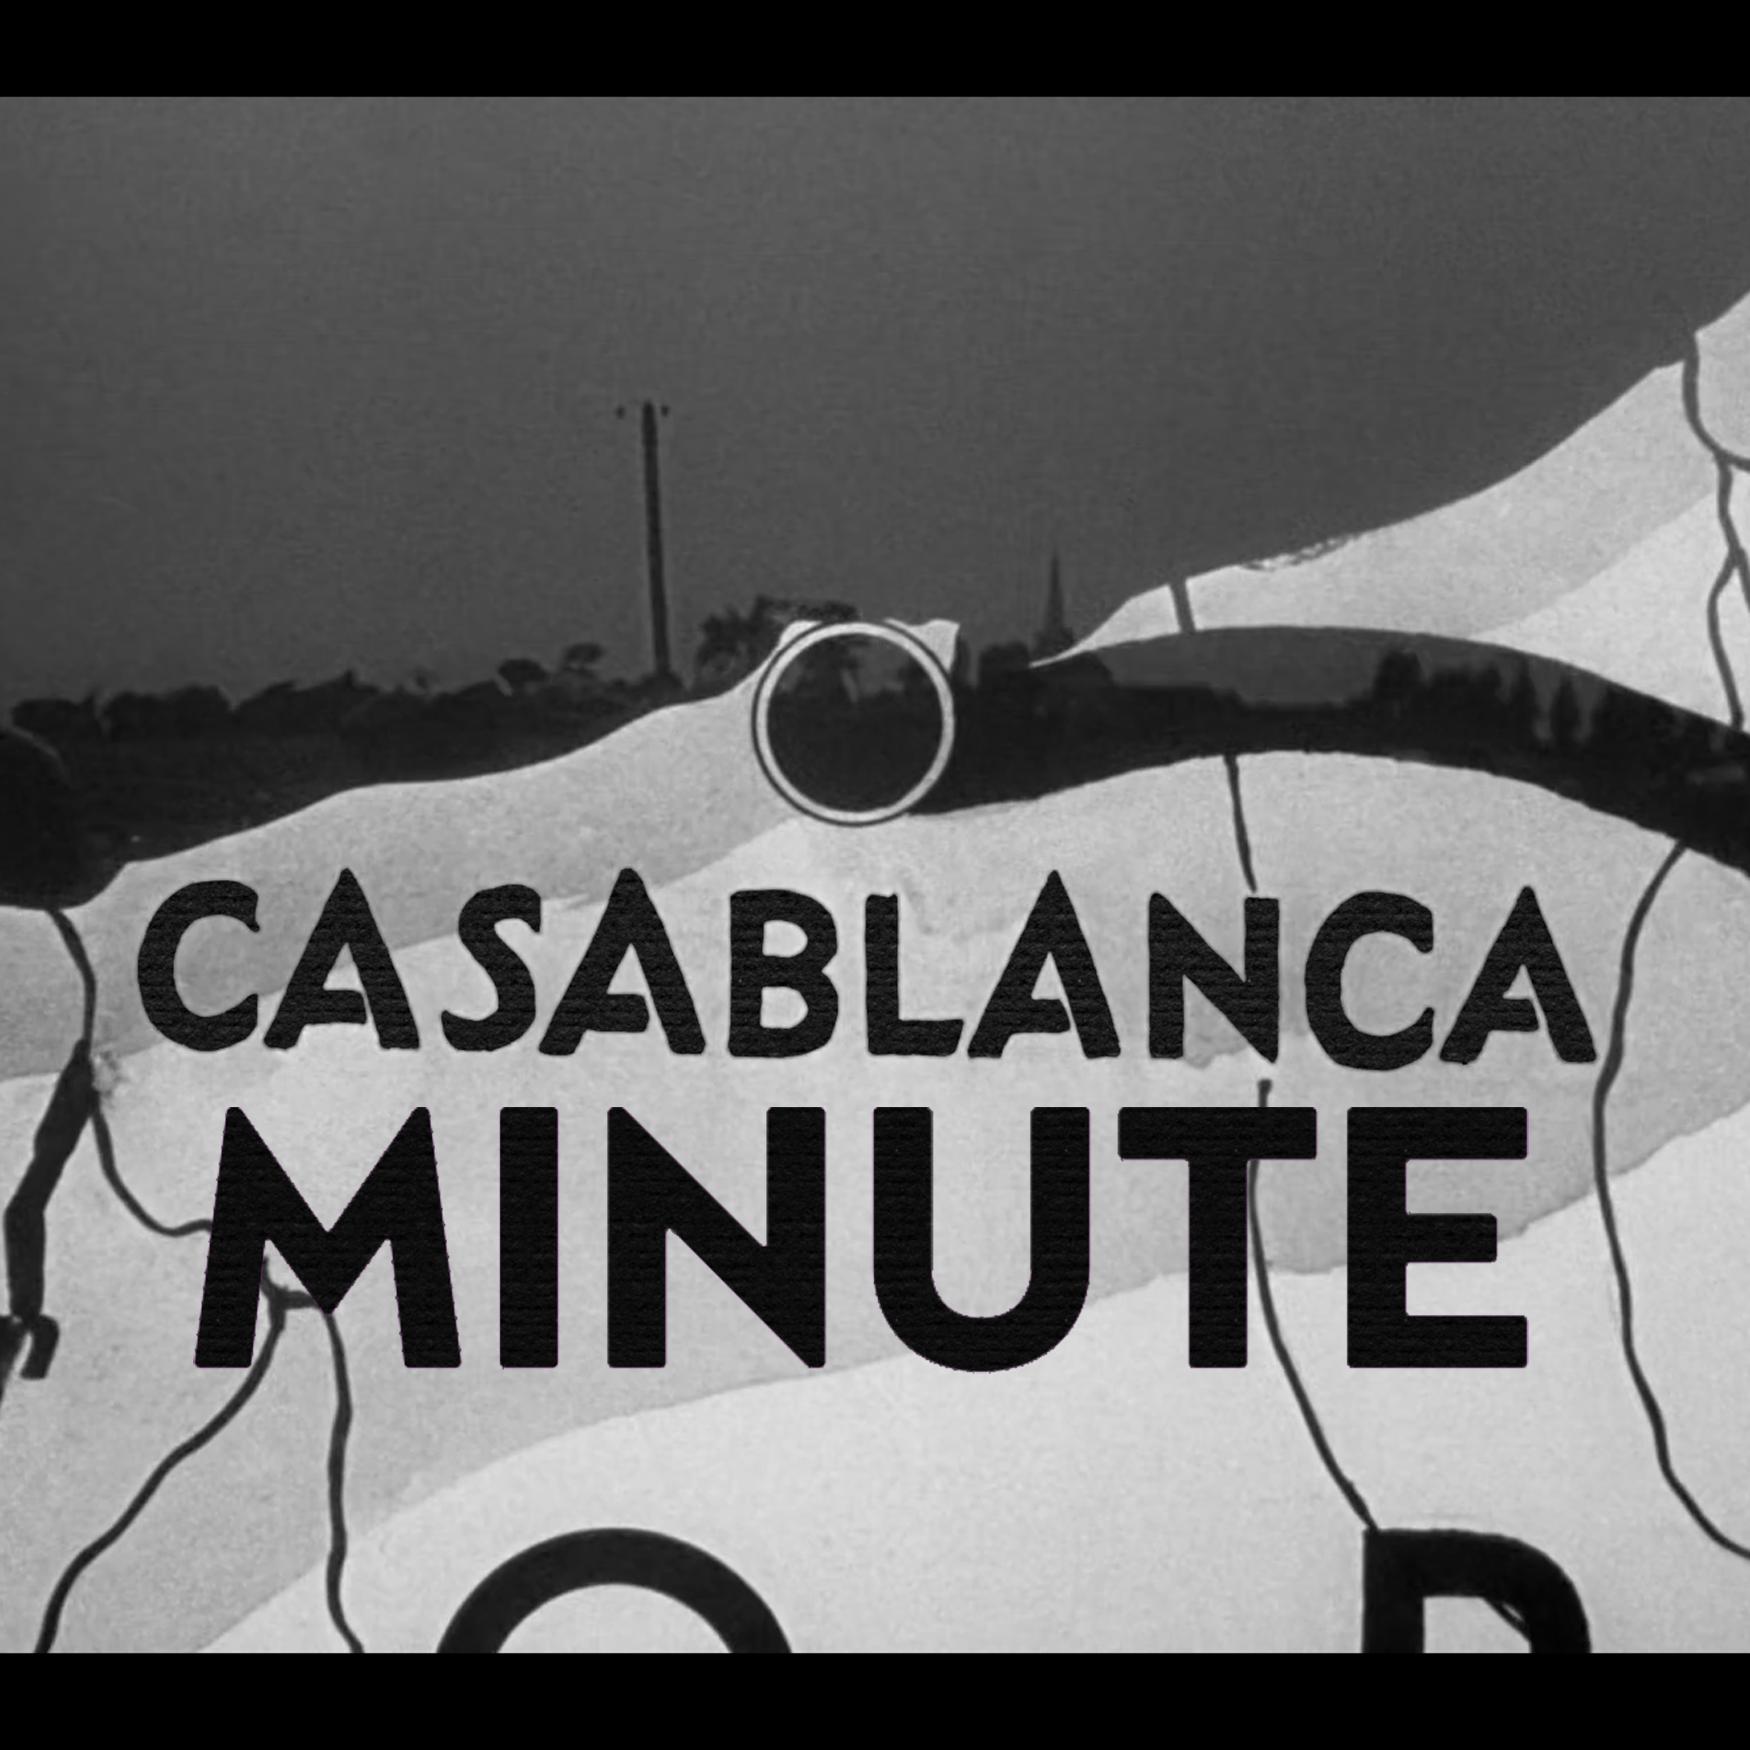 Casablanca Minute